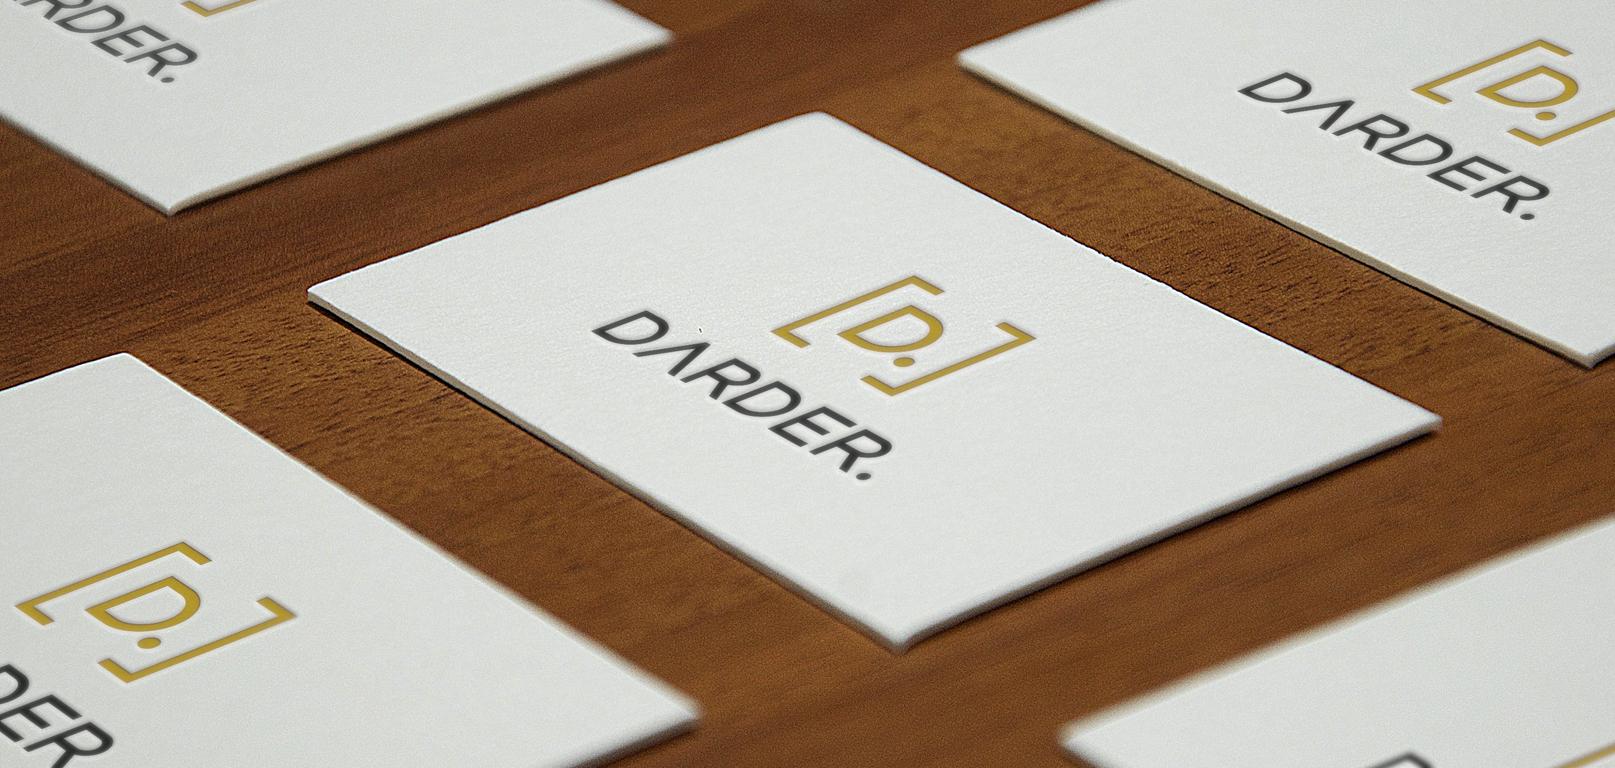 Diseño para Sergi Darder.